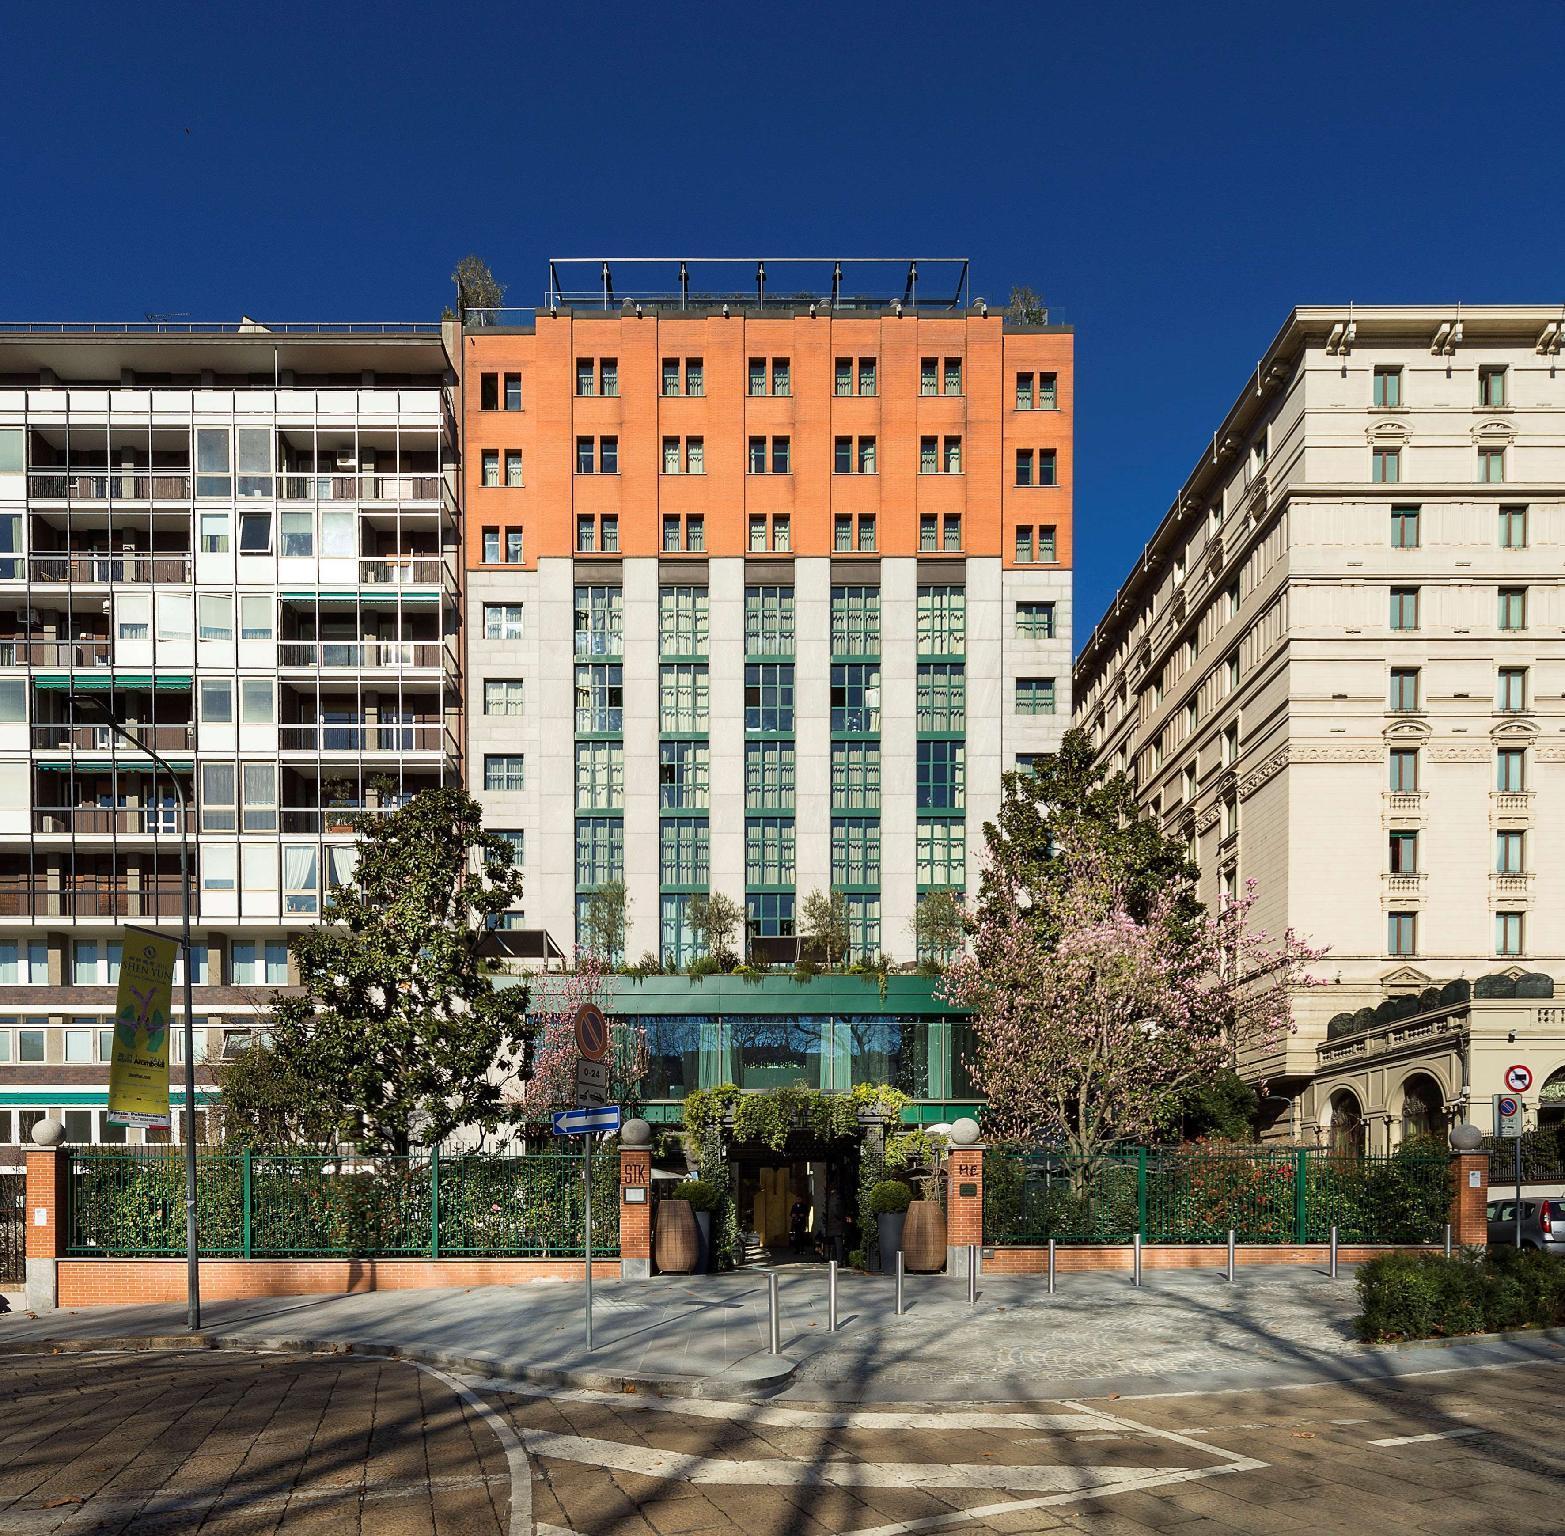 ME Milan Il Duca Hotel